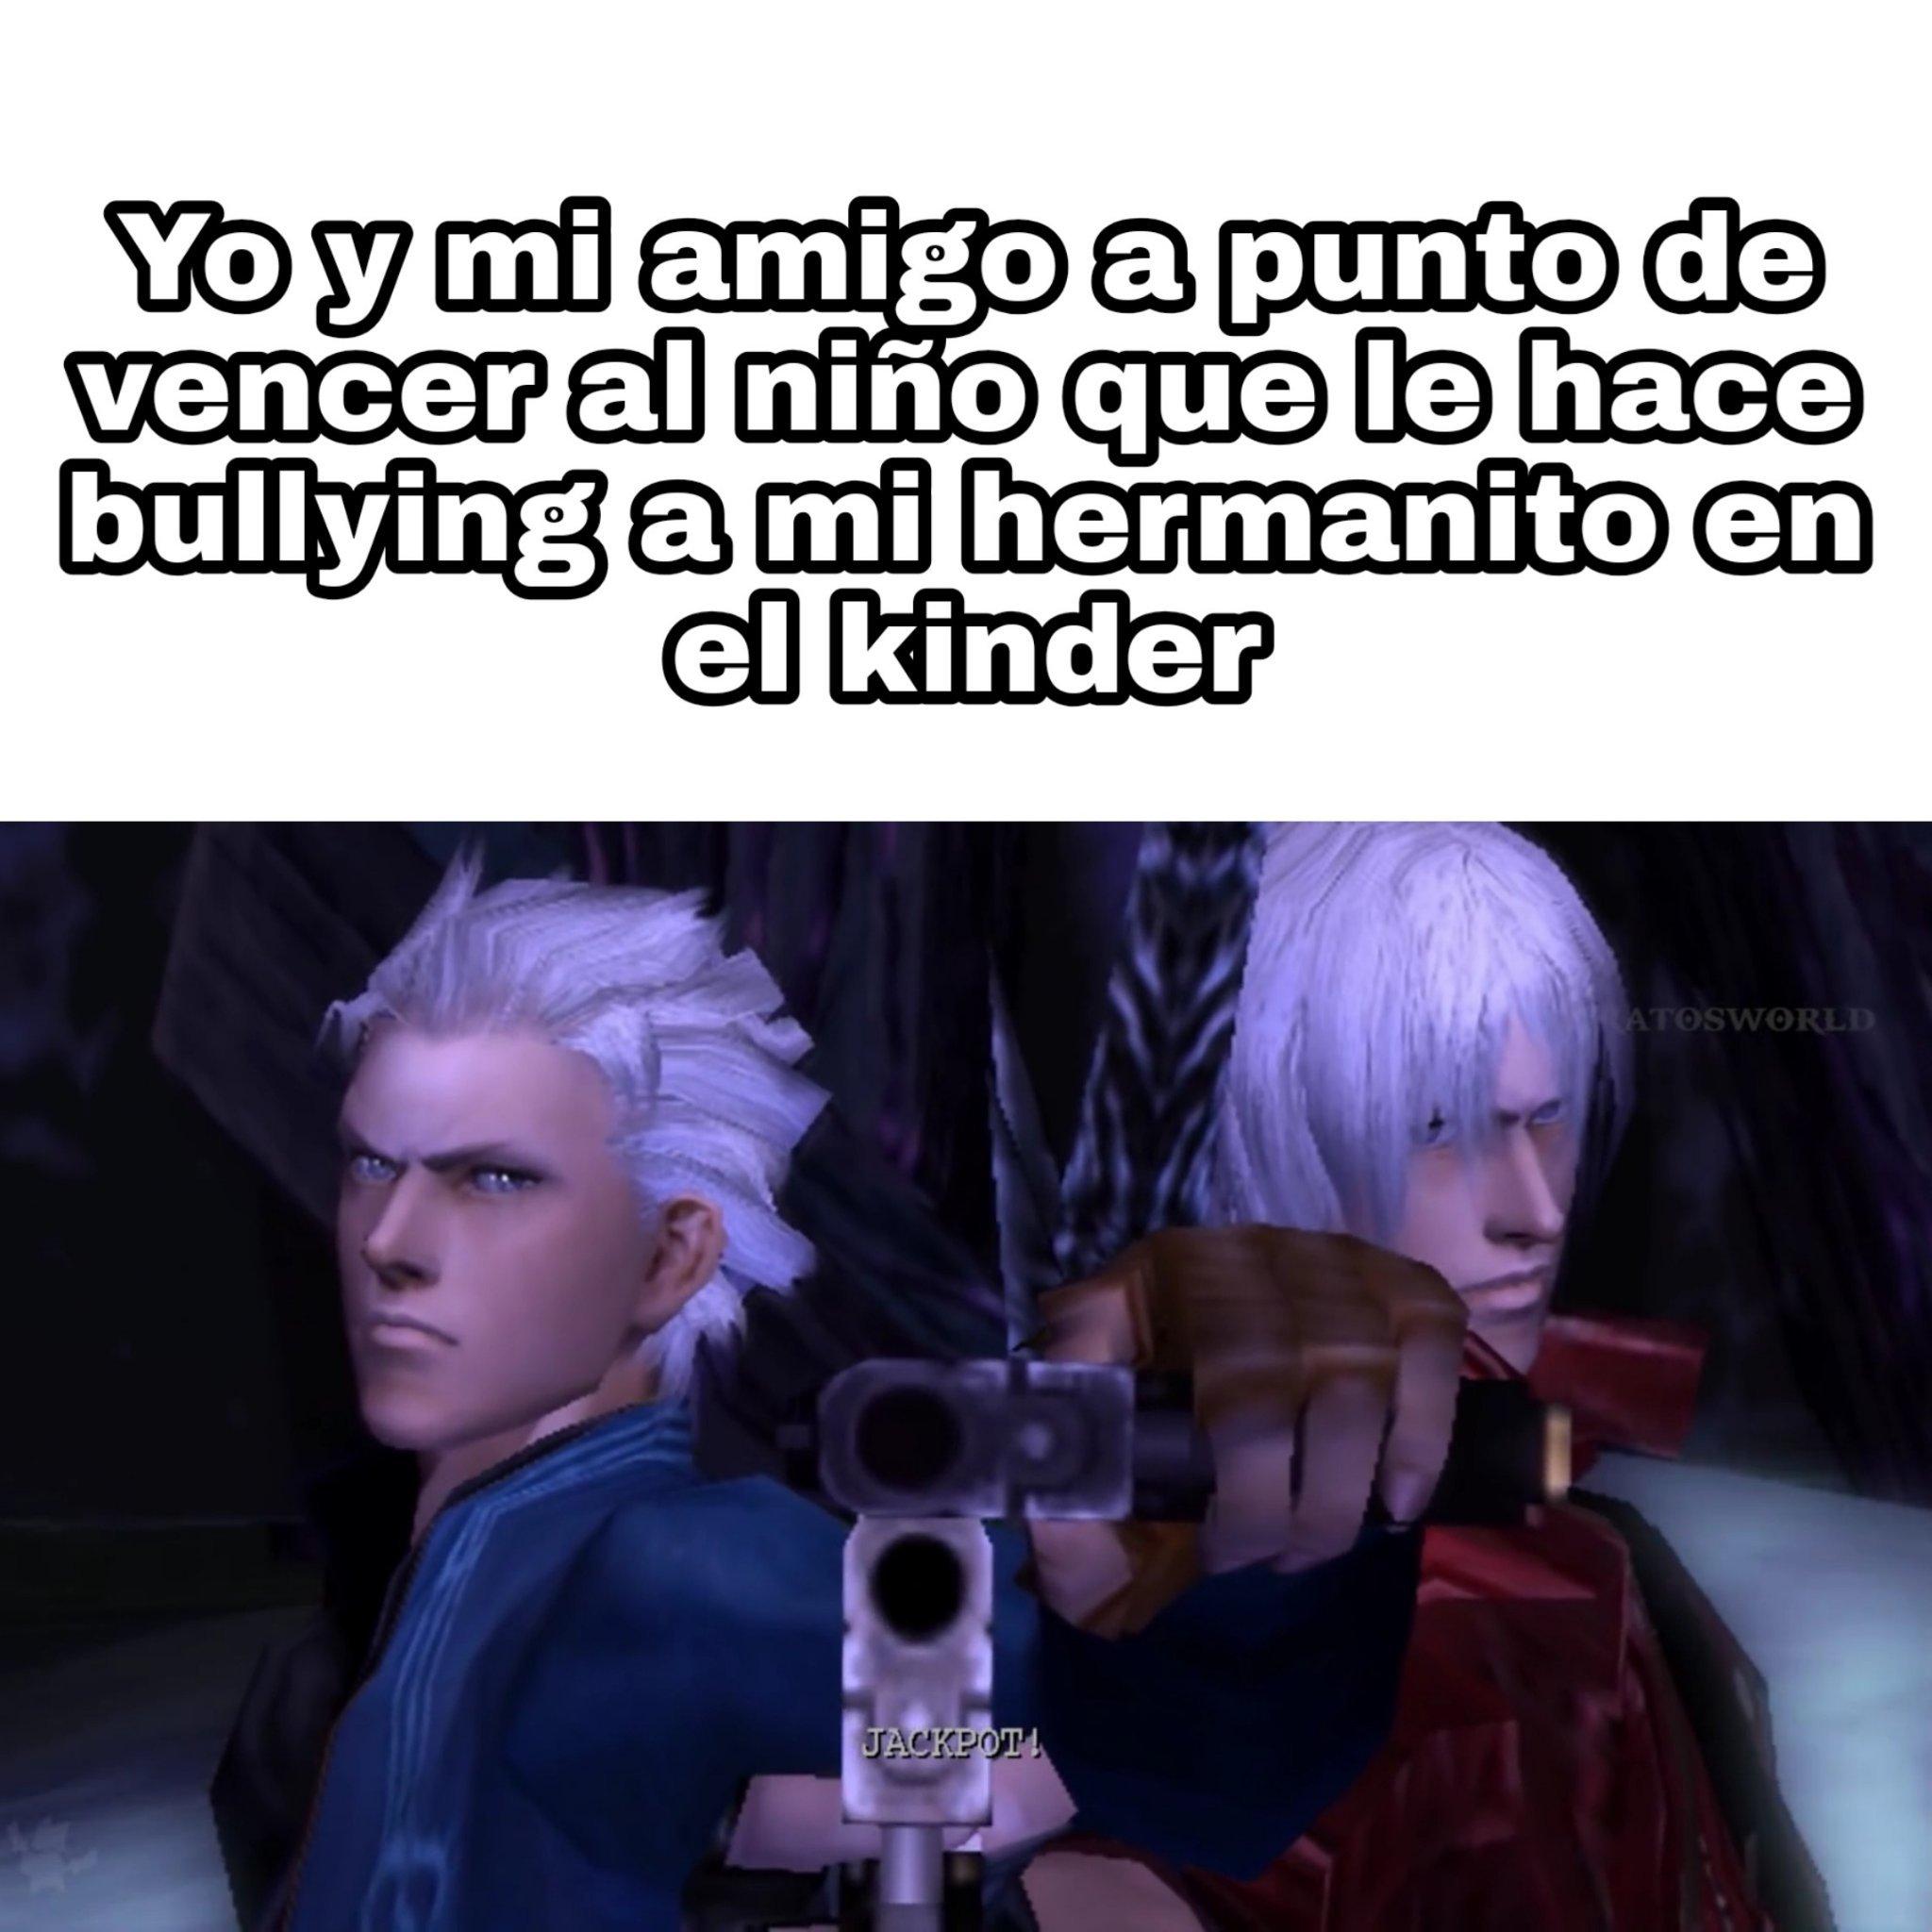 J A C K P O T ! - meme